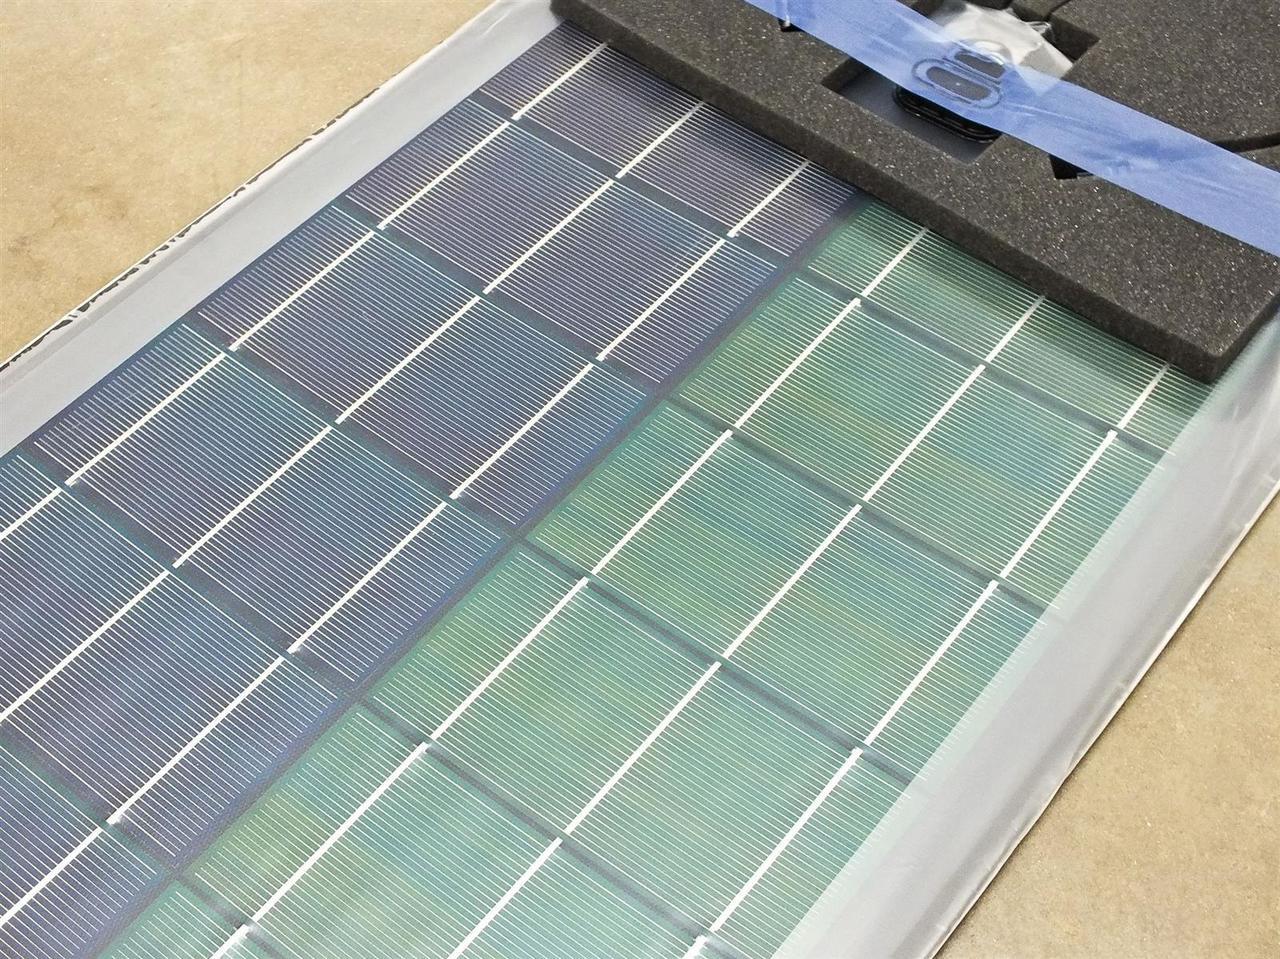 Global Solar Powerflex 2 Bipv 90 Watt 12 Volt Flexible